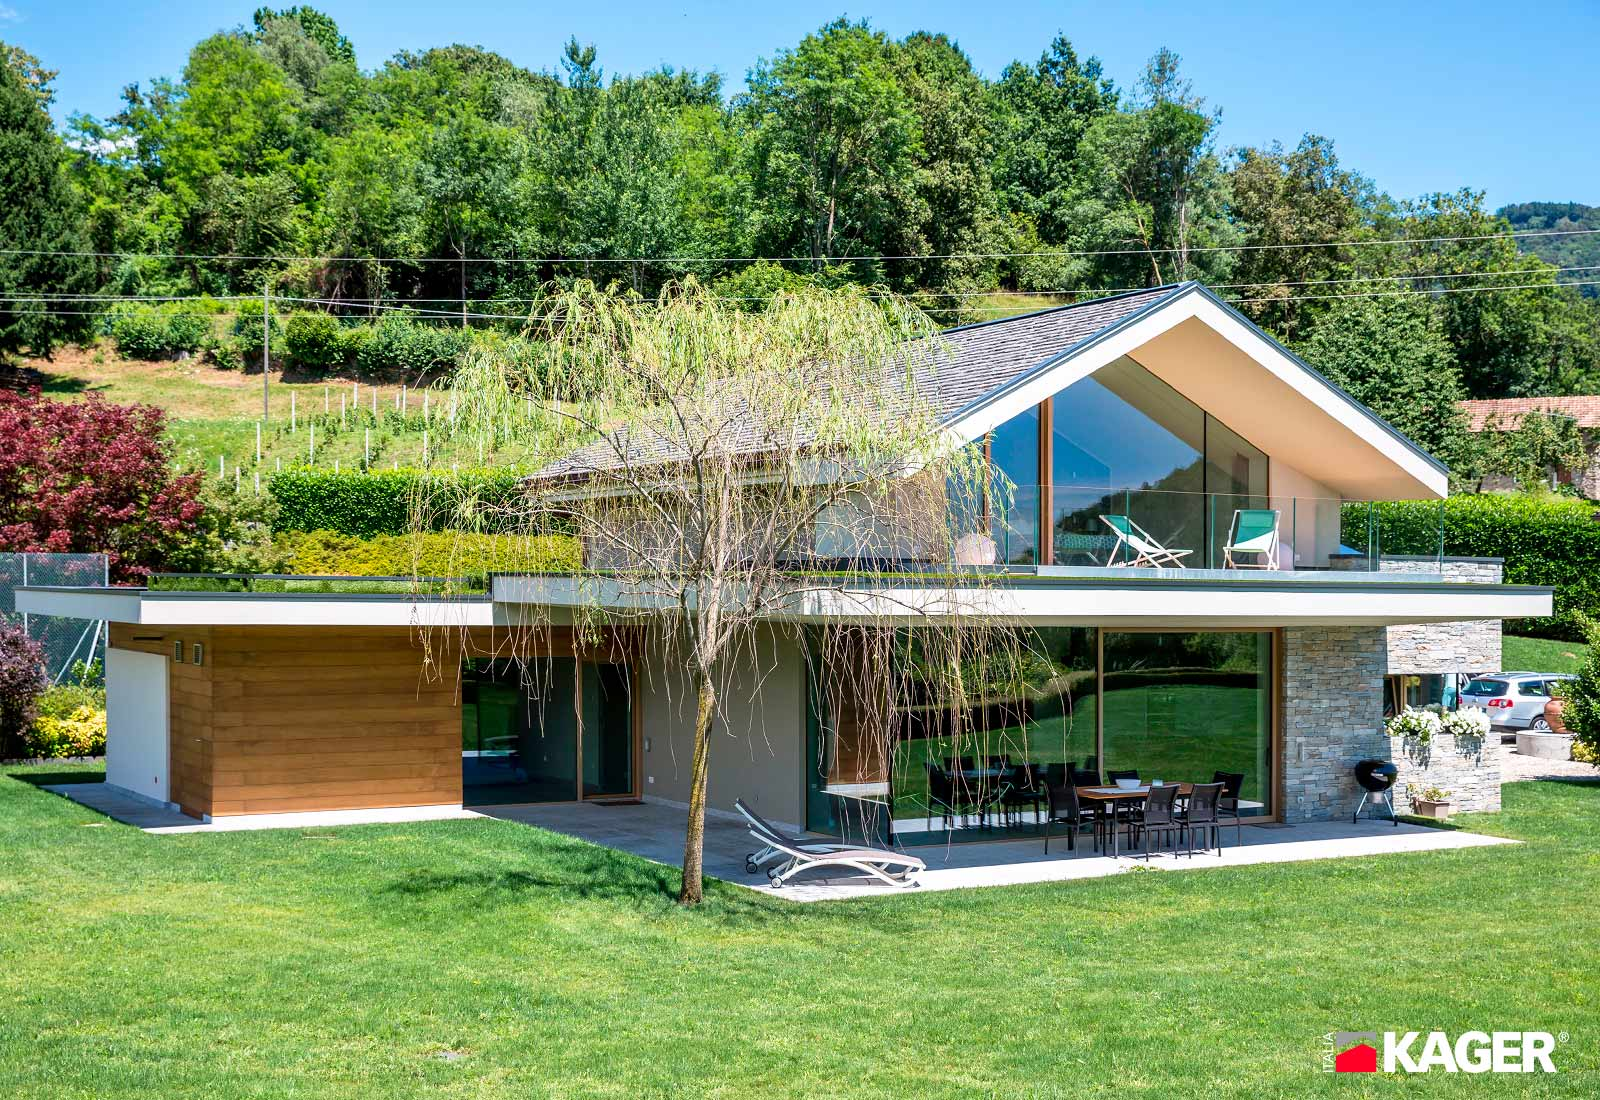 Casa-in-legno-Novara-Kager-Italia-01